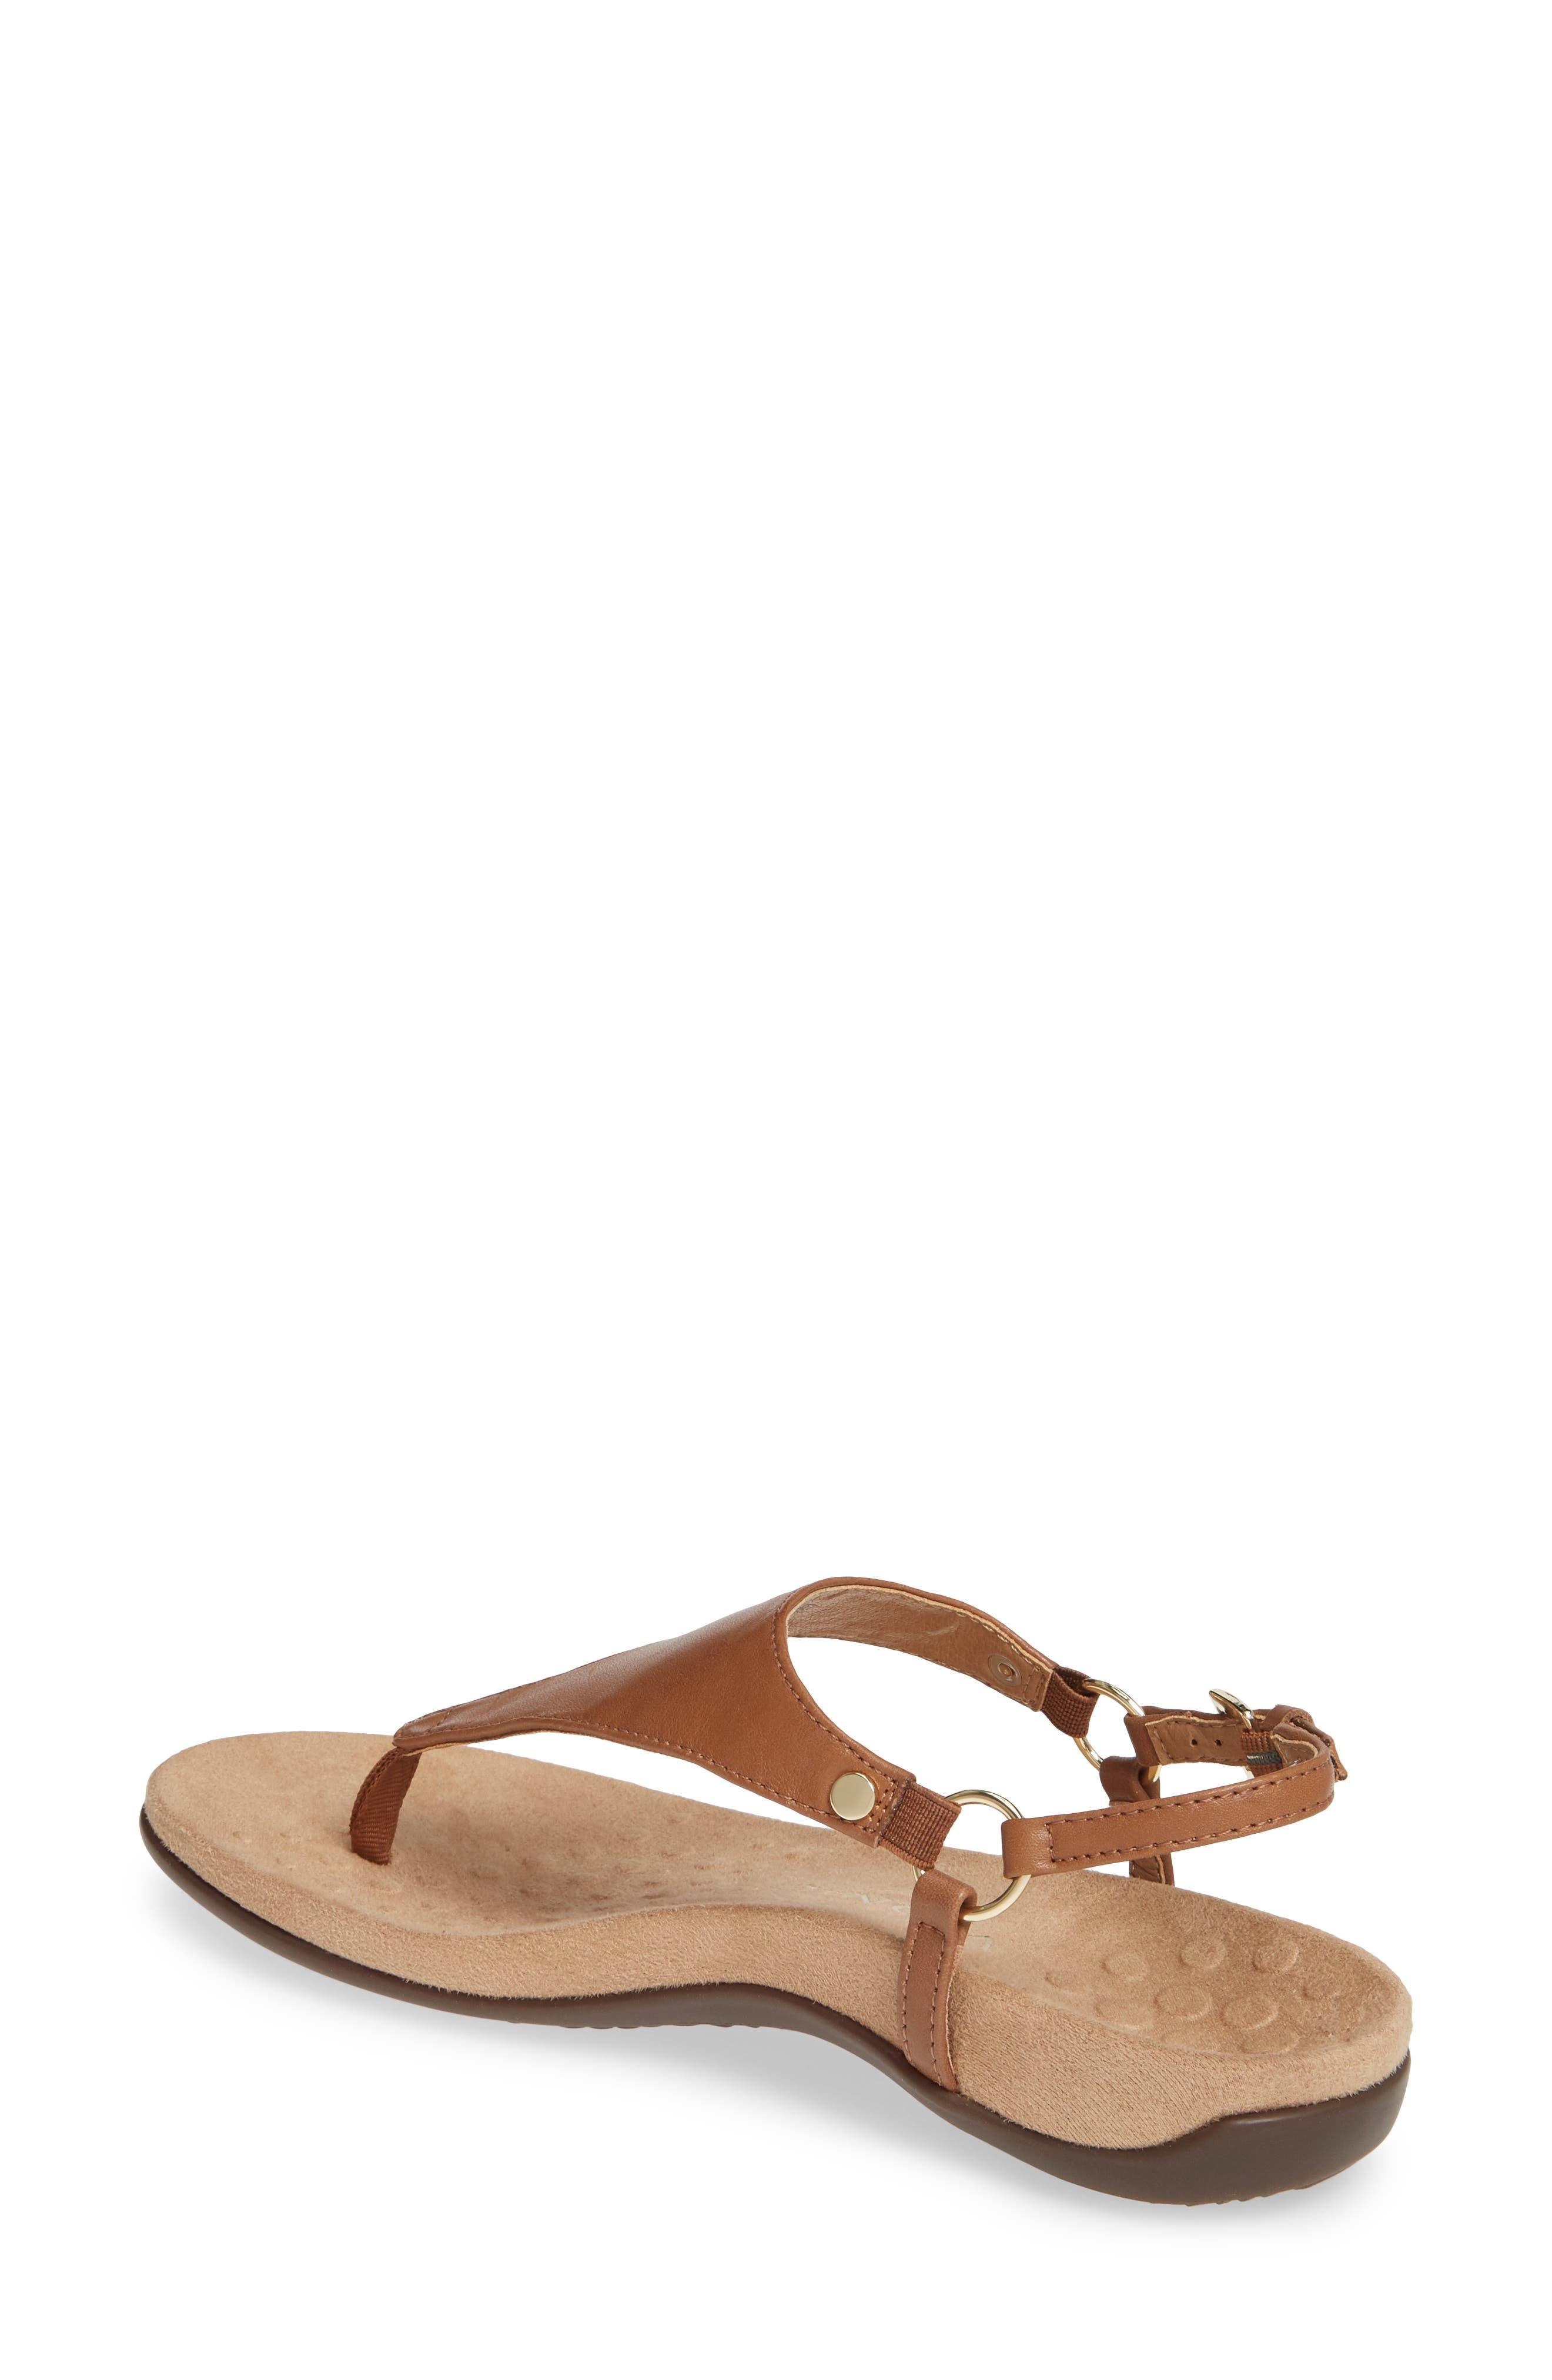 96732f7d626 Women's Vionic Sandals | Nordstrom